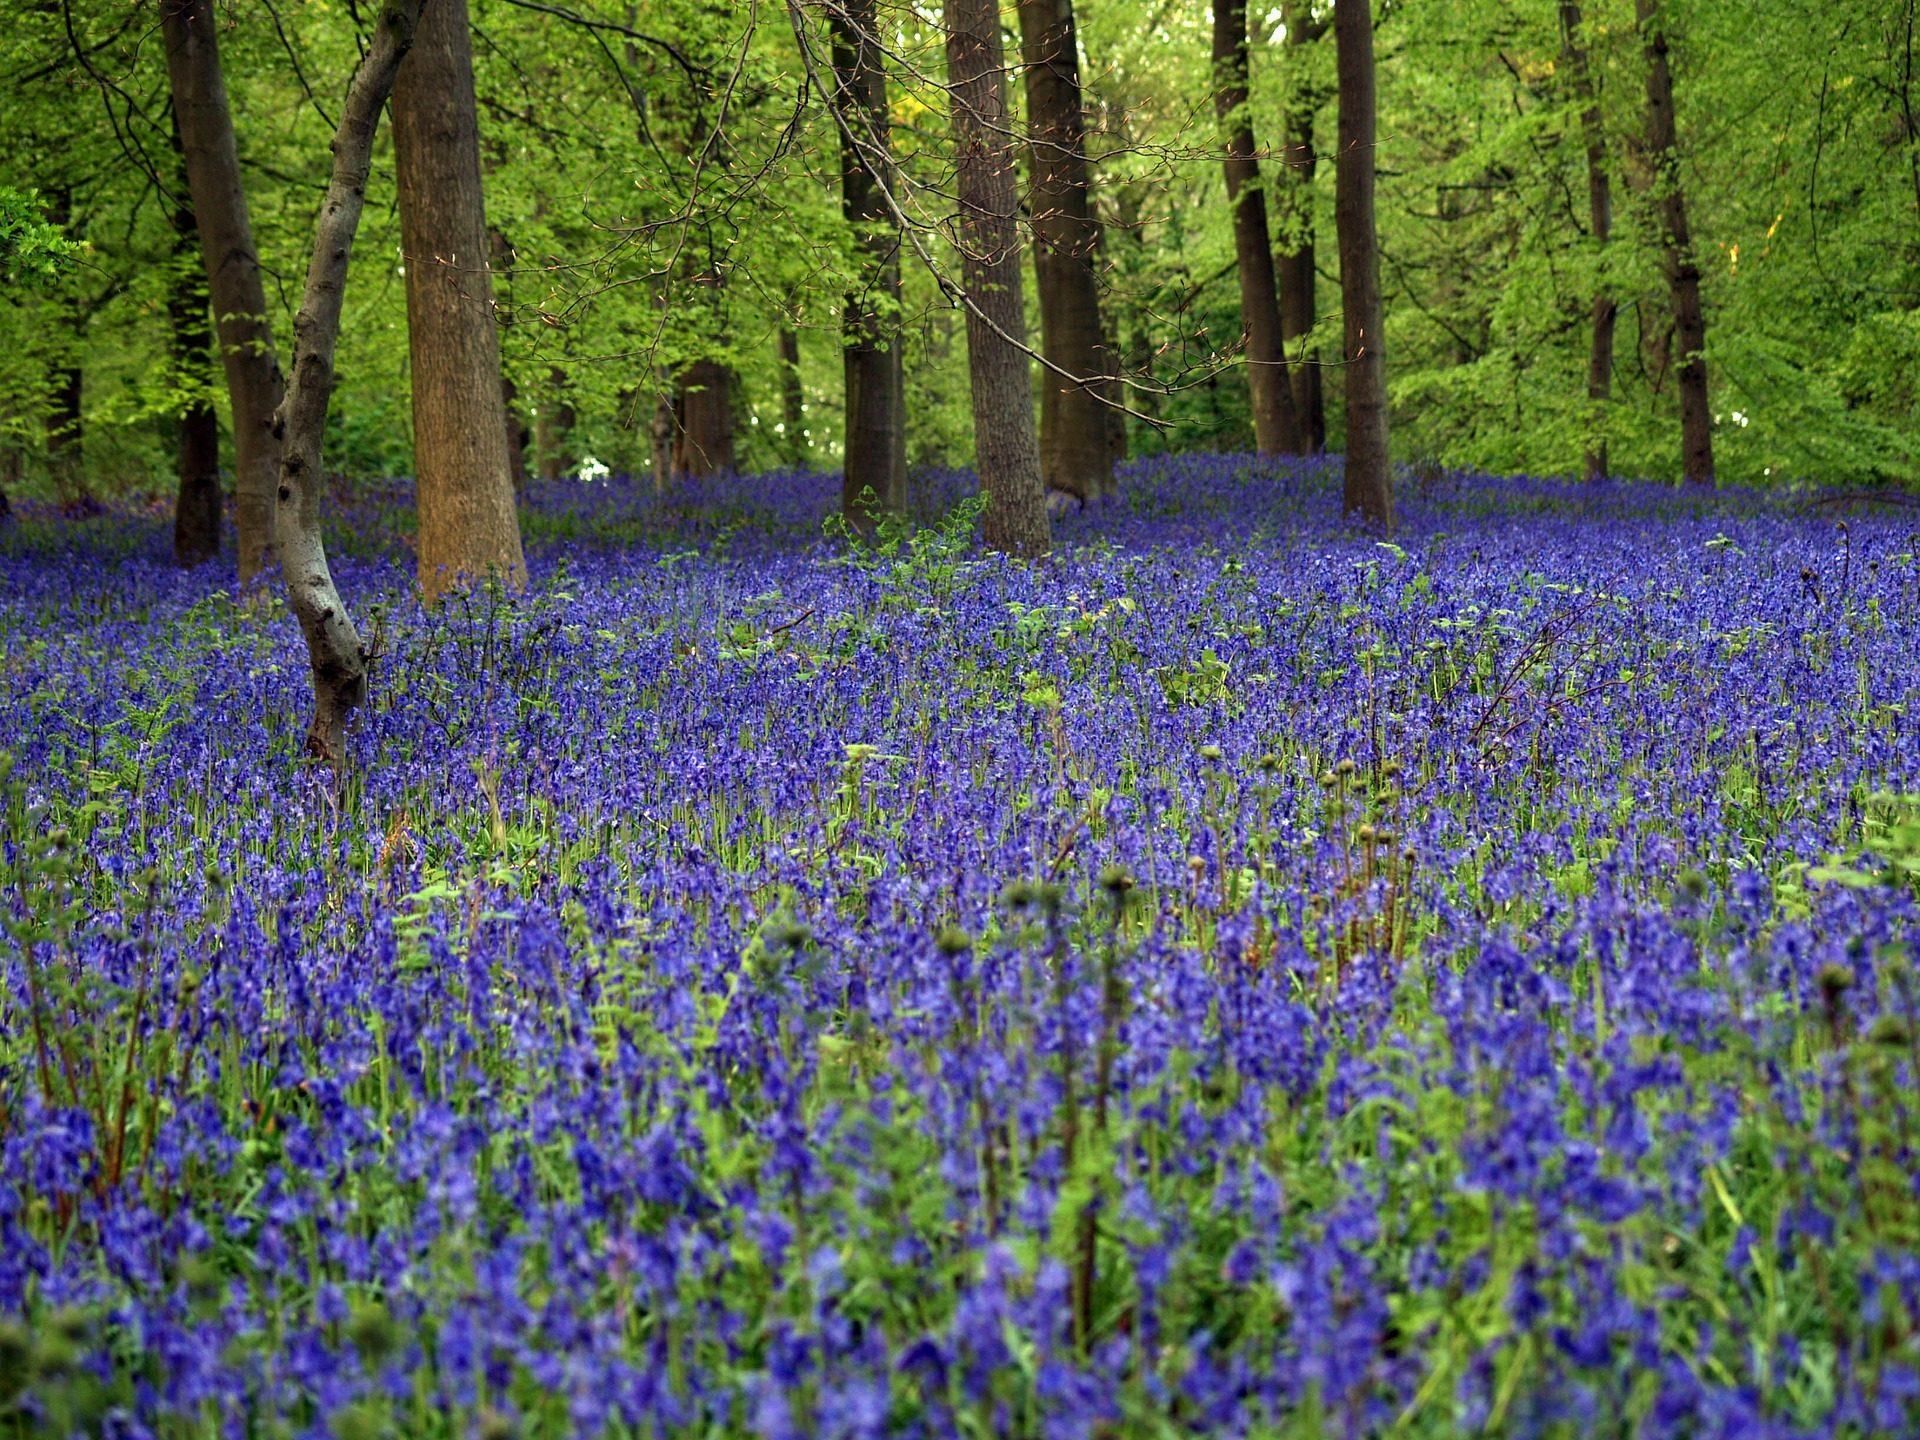 Feld, Wald, Bäume, Kampanilen, Blau, Pflanzen - Wallpaper HD - Prof.-falken.com